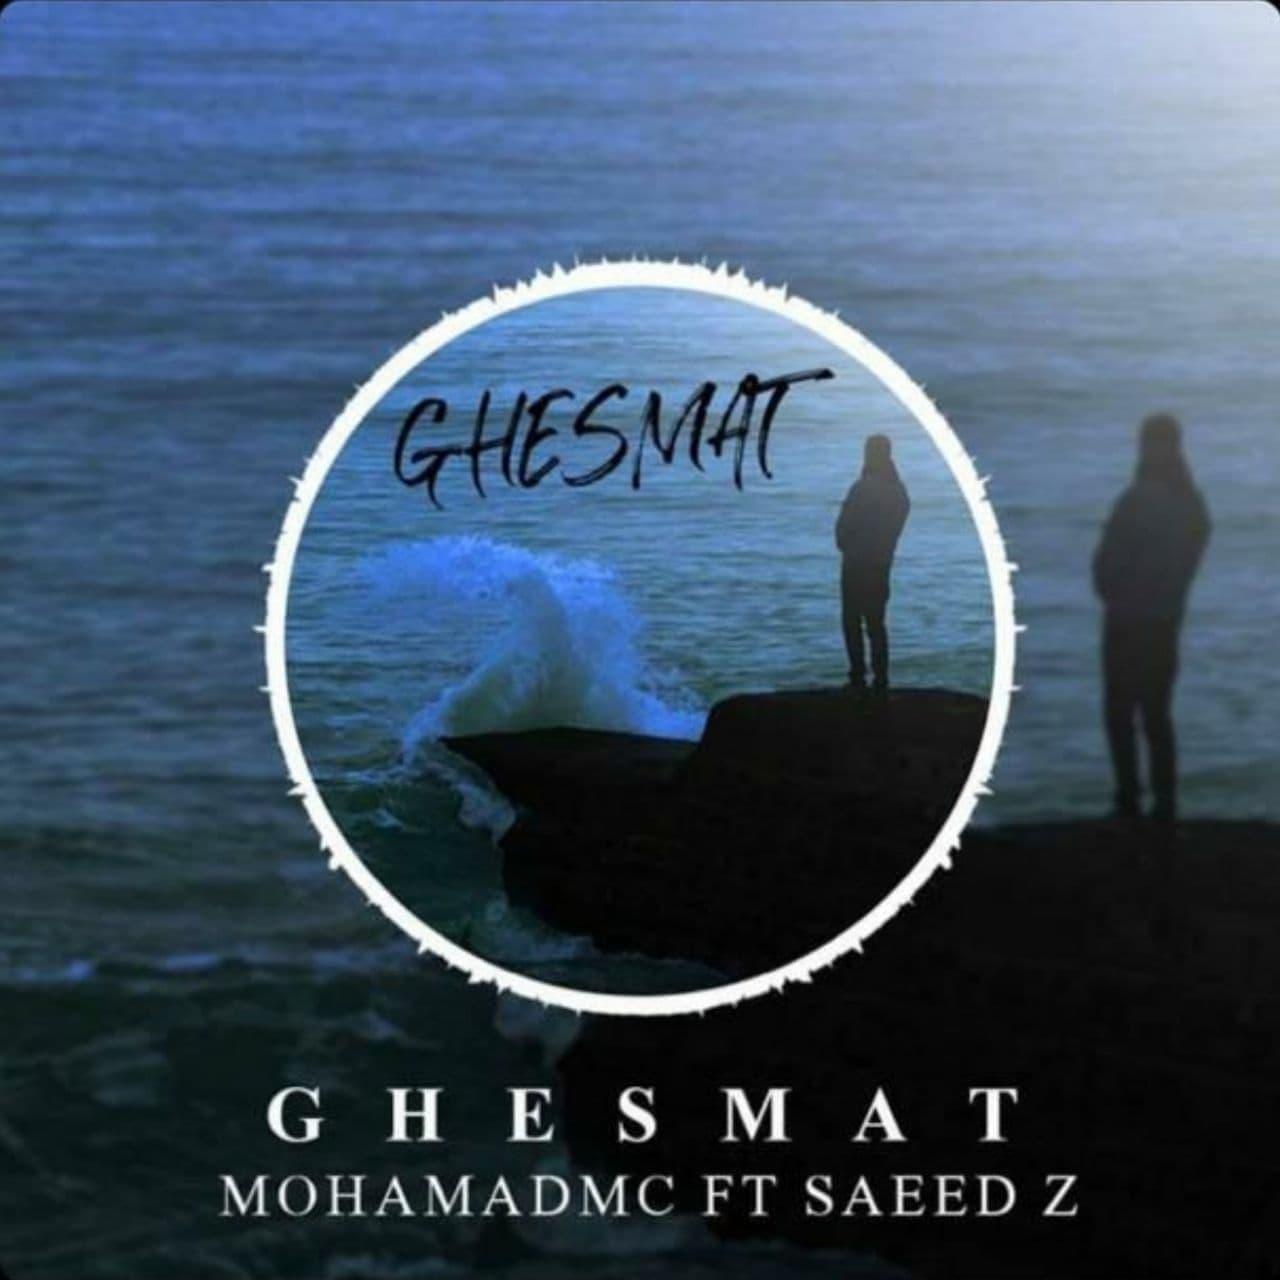 Mohamad MC ft Saeed Z – Ghesmat